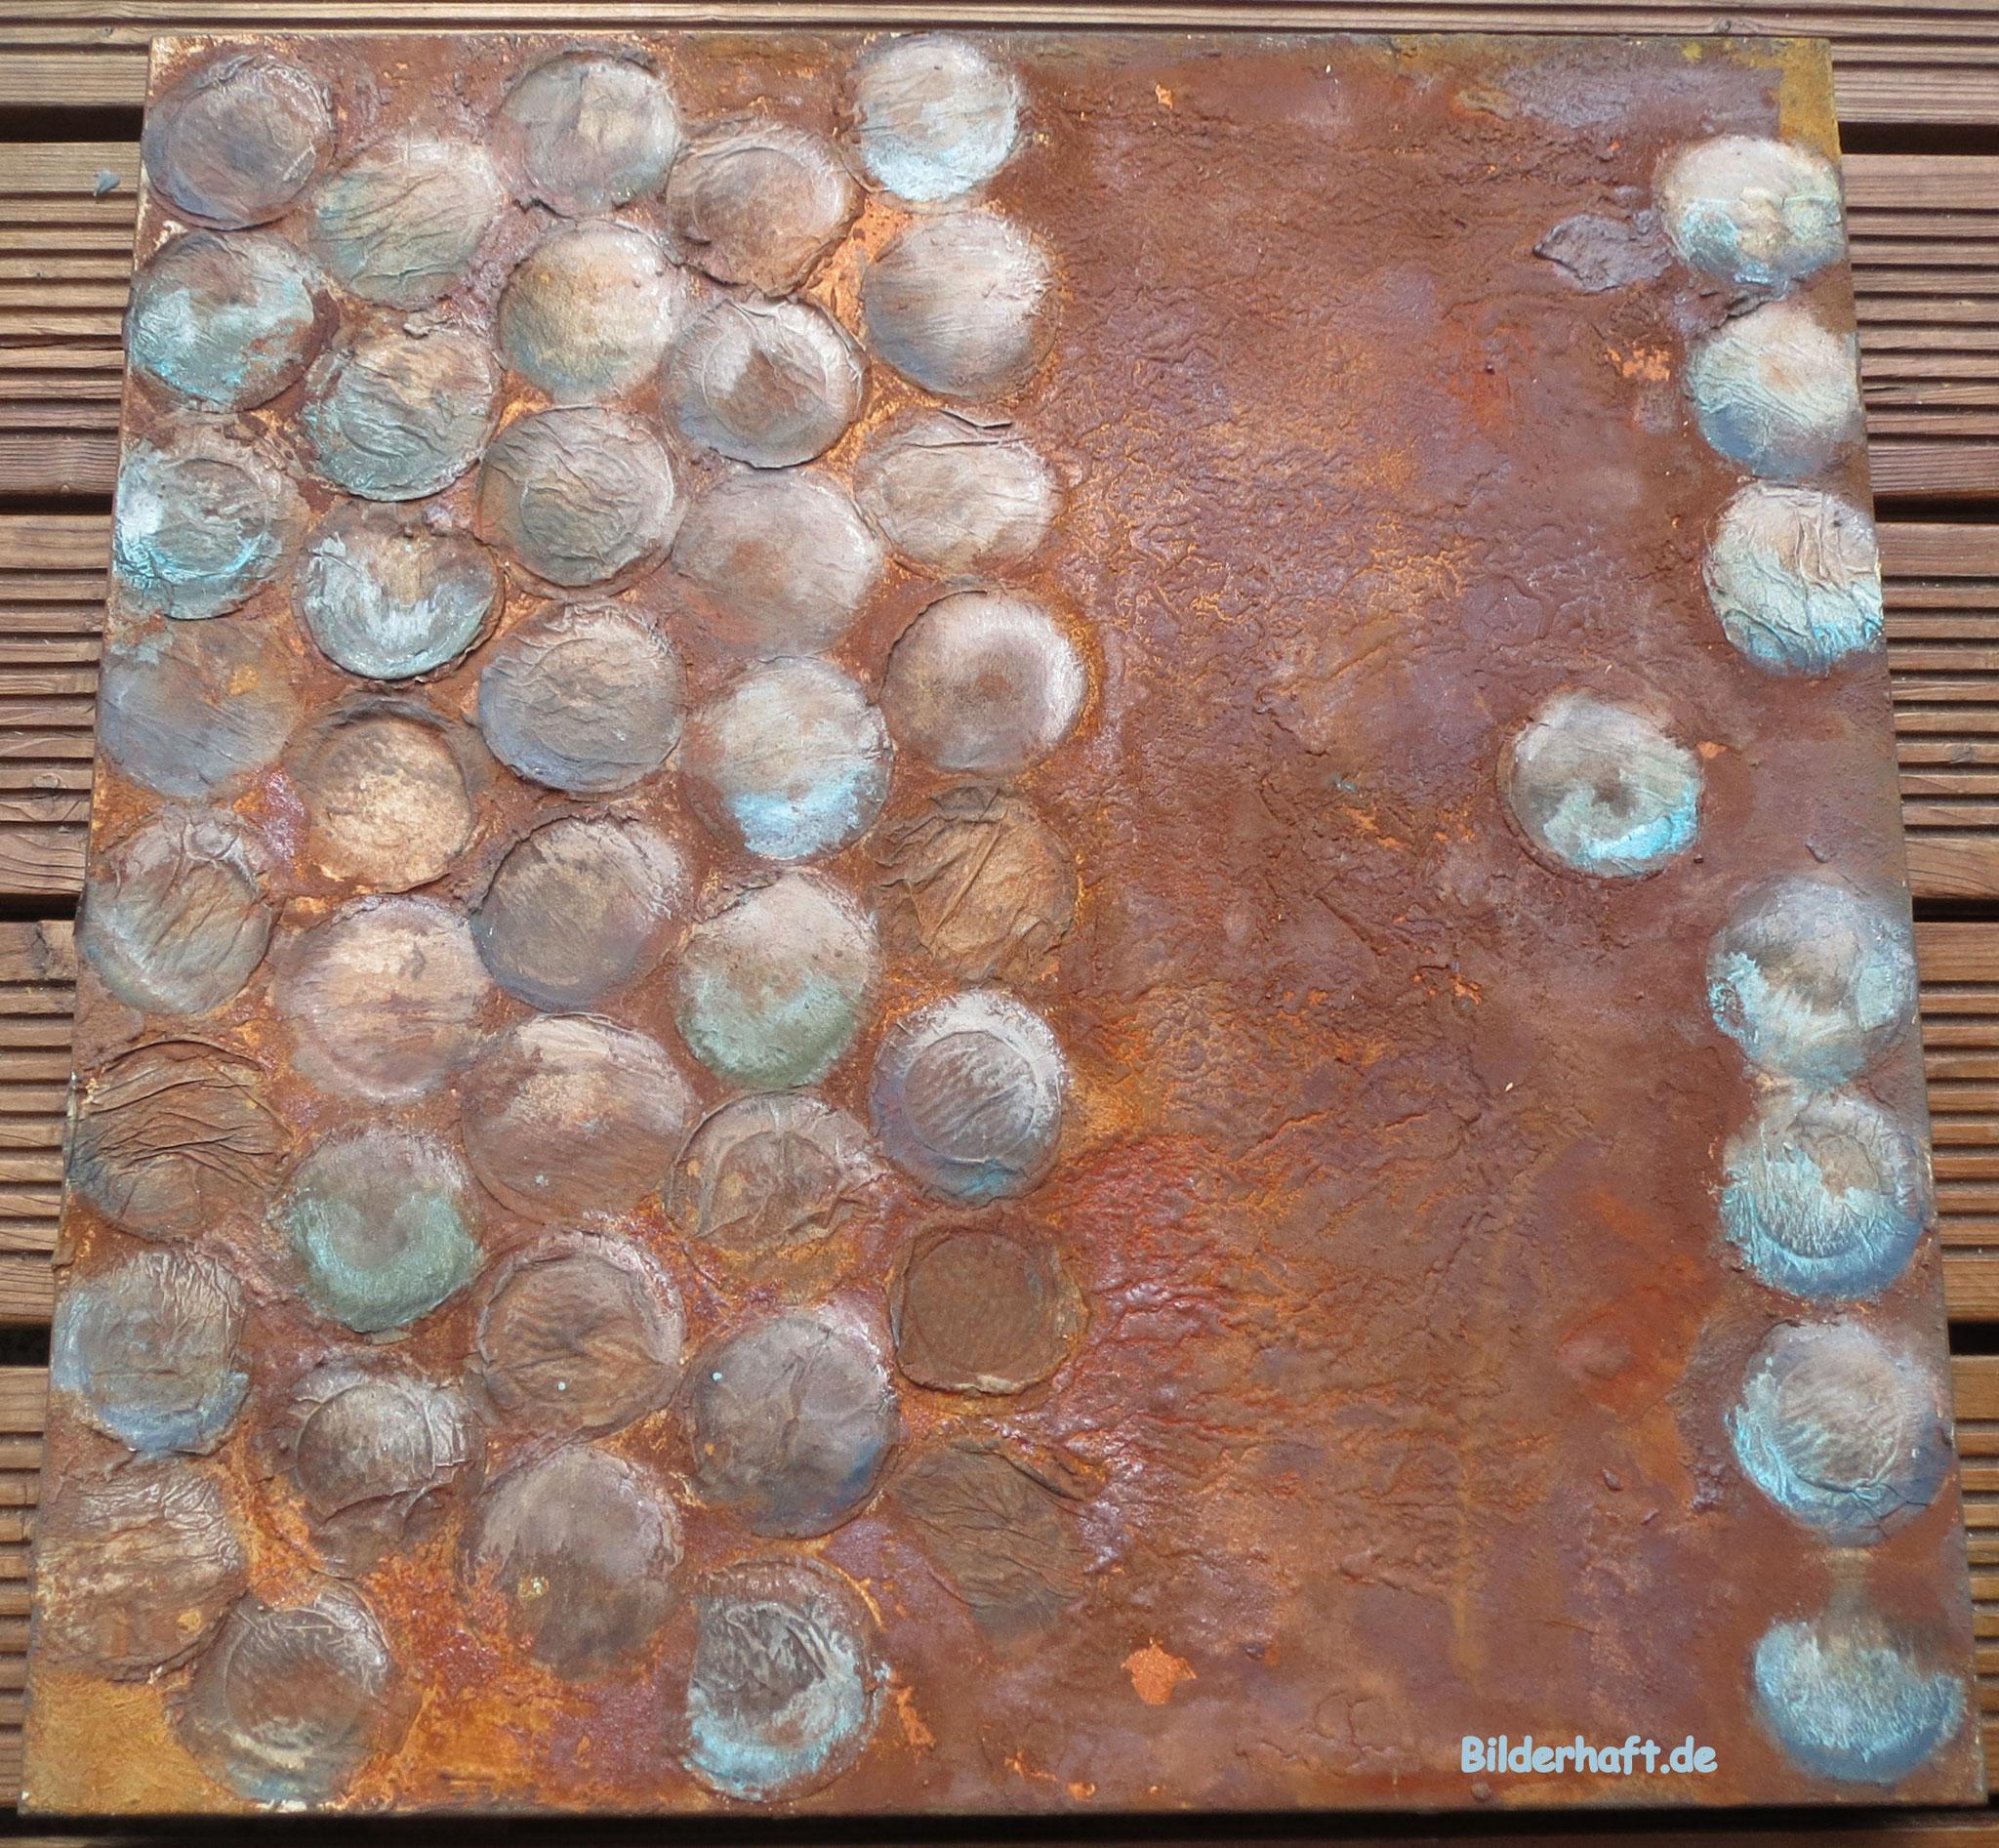 Rostige Rumkugeln, Mixed Media mit Rost, 60 x 60 x 4,5cm